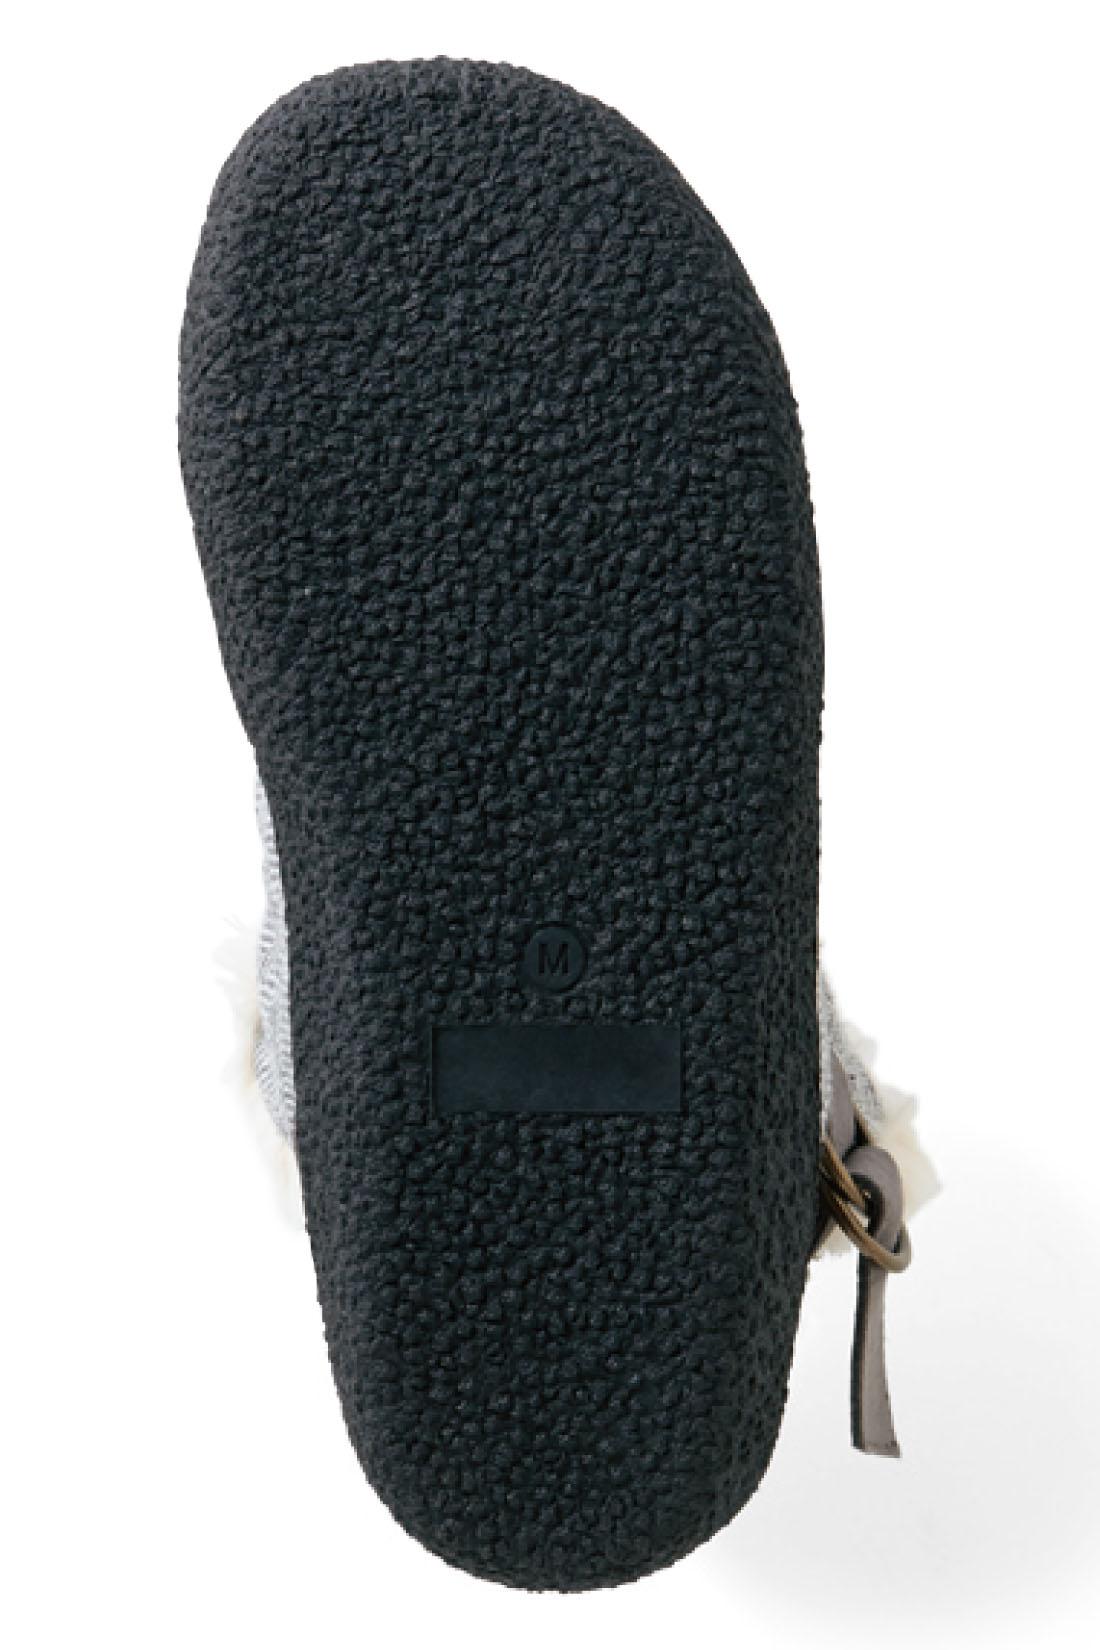 SOLE 滑りにくく、歩きやすいがっしりゴム底。